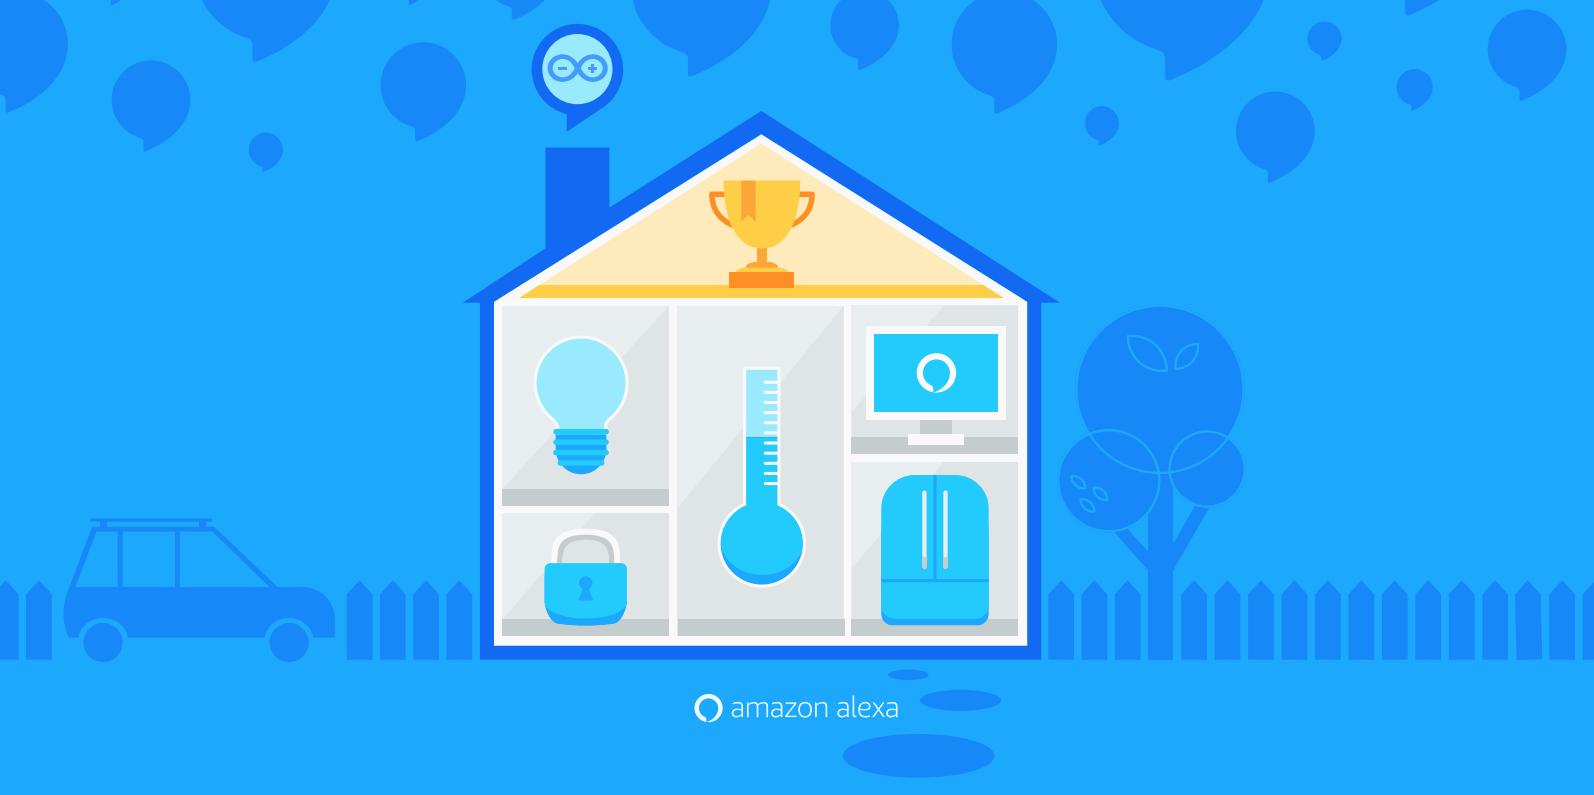 Arduino Blog » Create the smart home gadget of the future